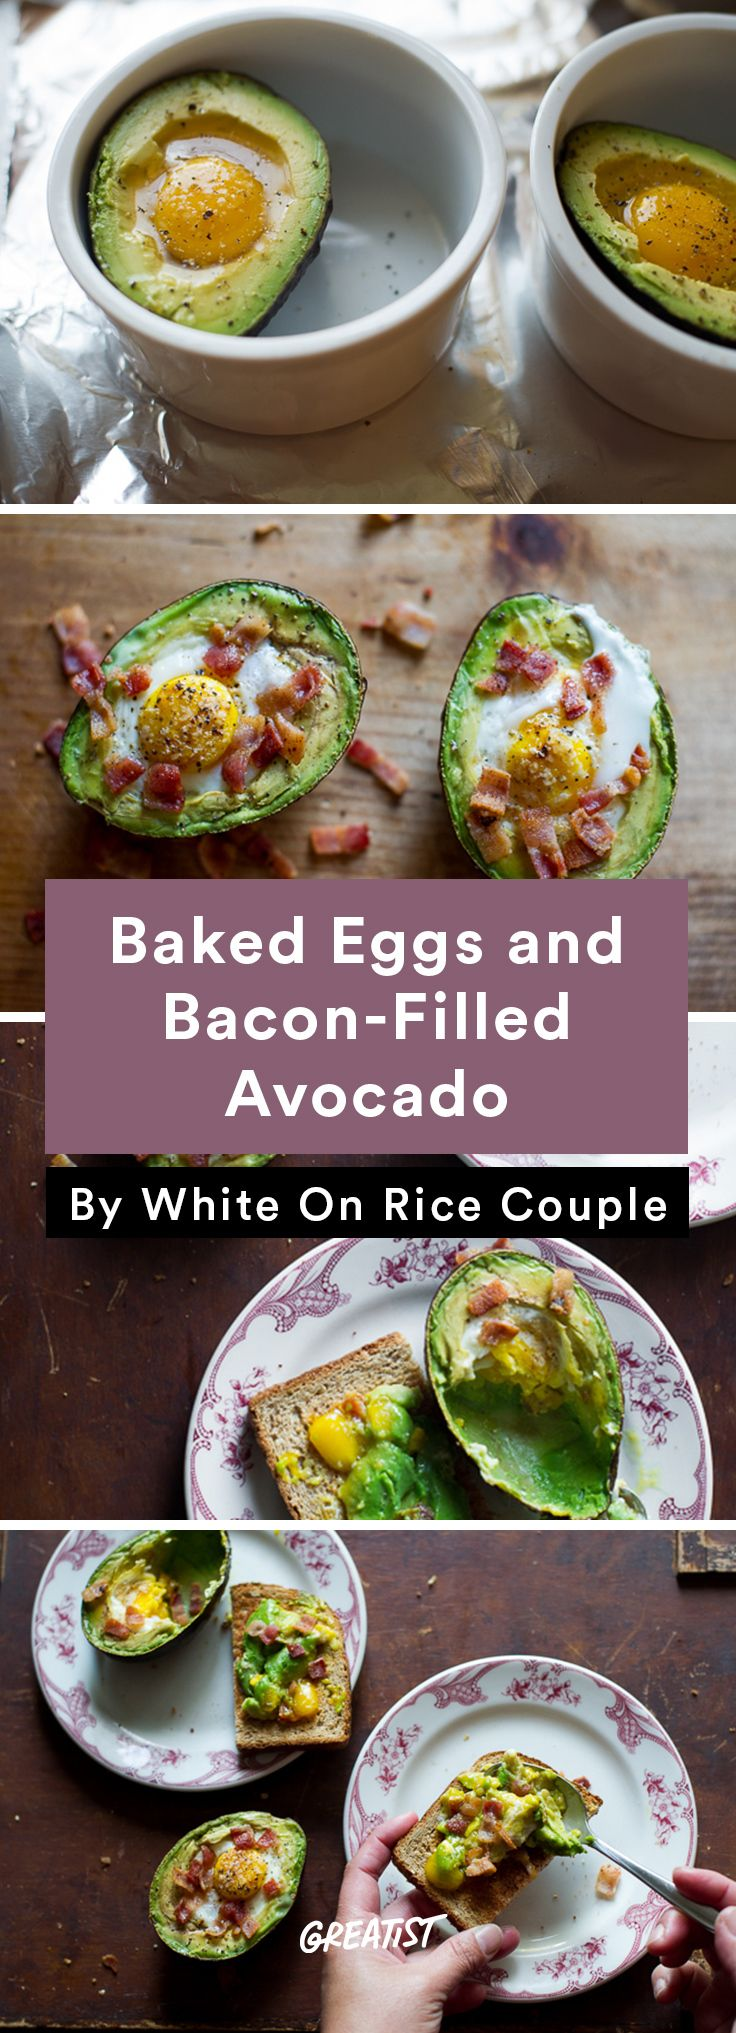 4. Baked Eggs and Bacon-Filled Avocado #healthy #recipe #stuffedavocado #avocado http://greatist.com/eat/stuffed-avocado-recipes